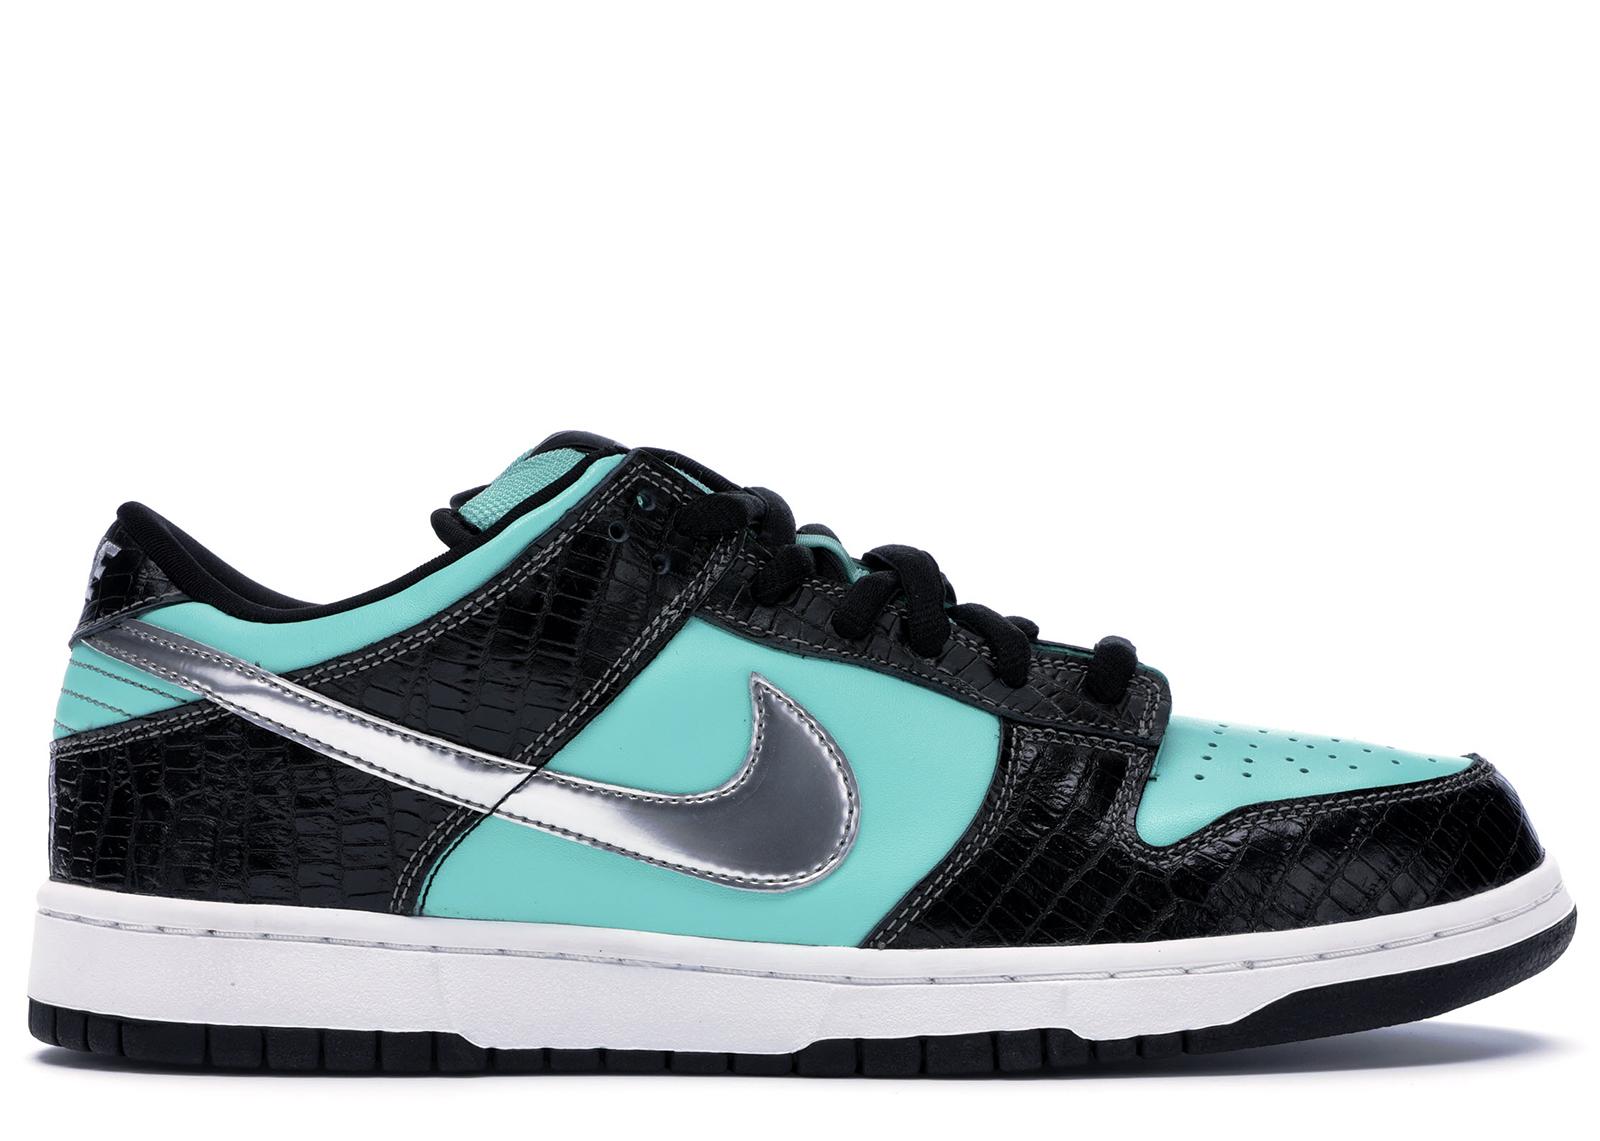 Nike Dunk SB Low Diamond Supply Co